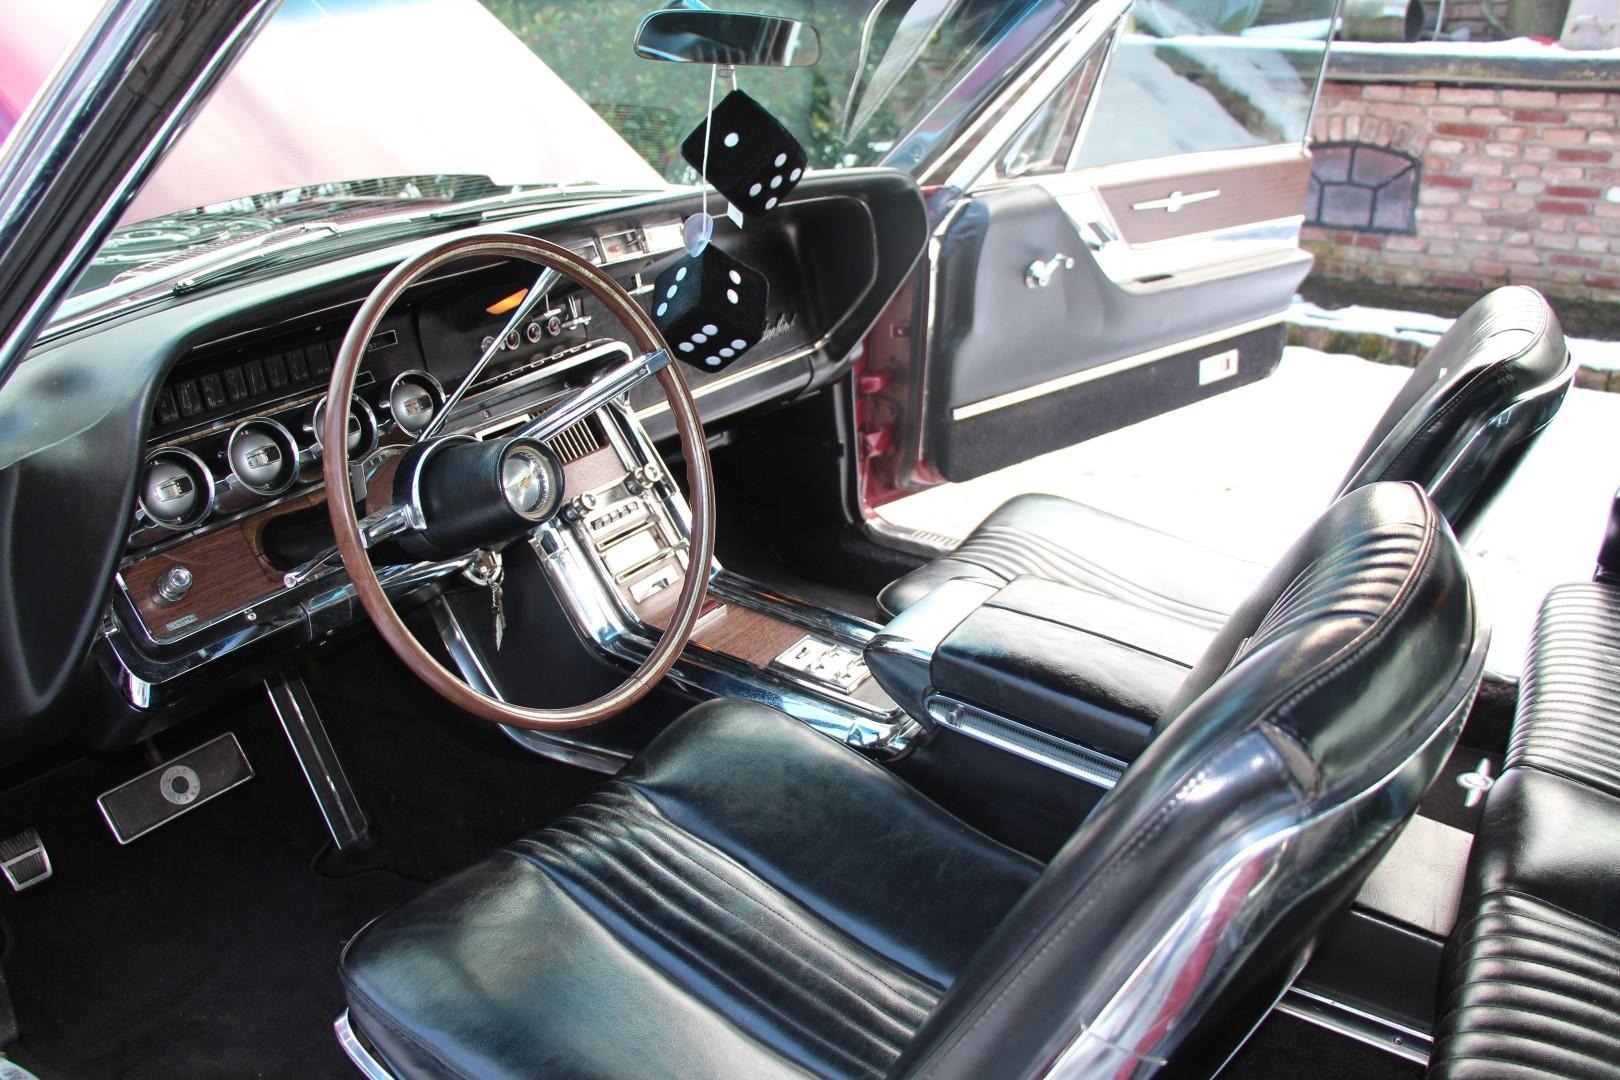 1965 Ford Thunderbird Hardtop - Burgundy new (2)